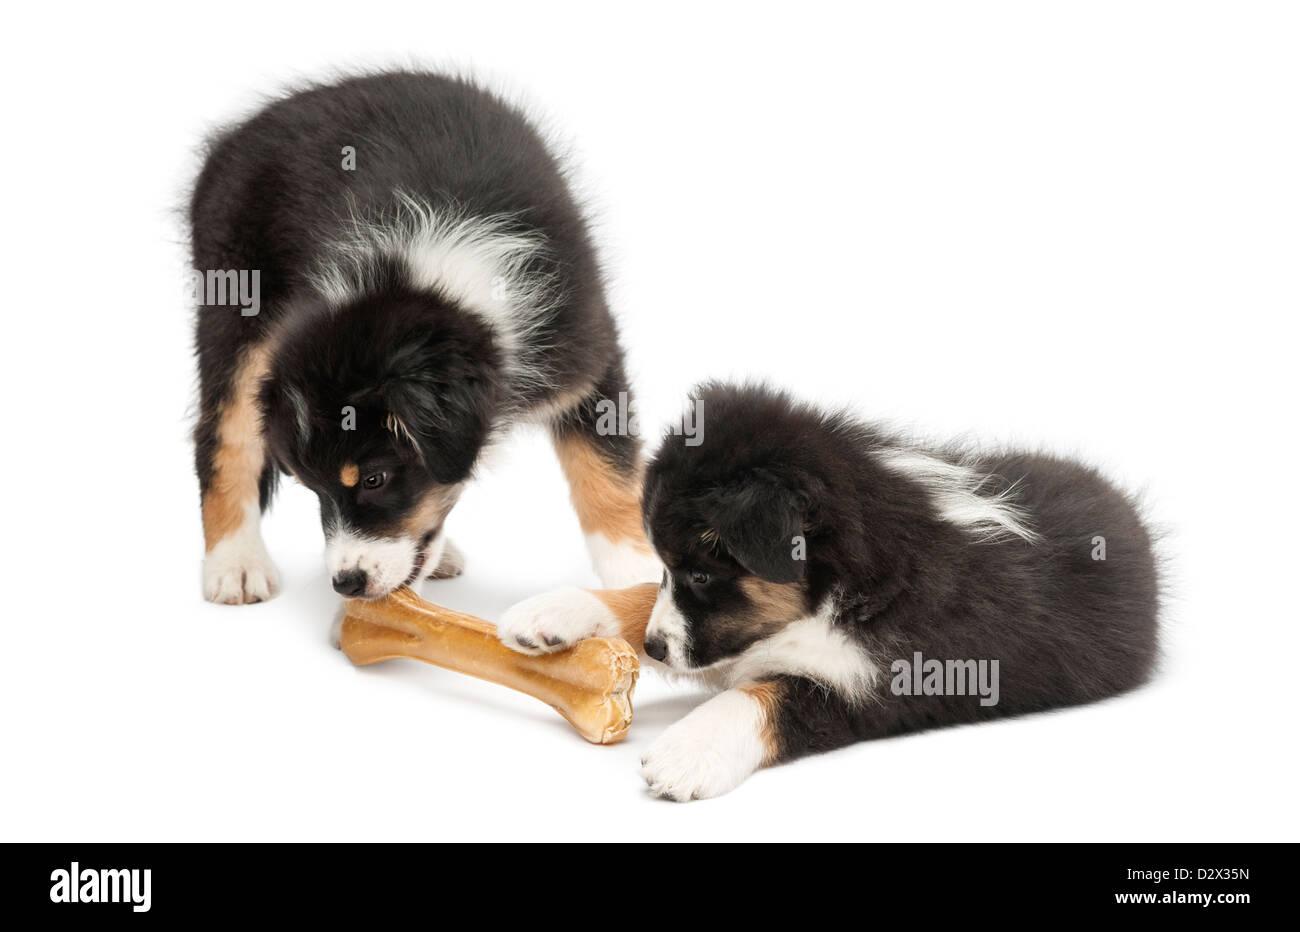 2 Australian Shepherds Stockfotos & 2 Australian Shepherds Bilder ...